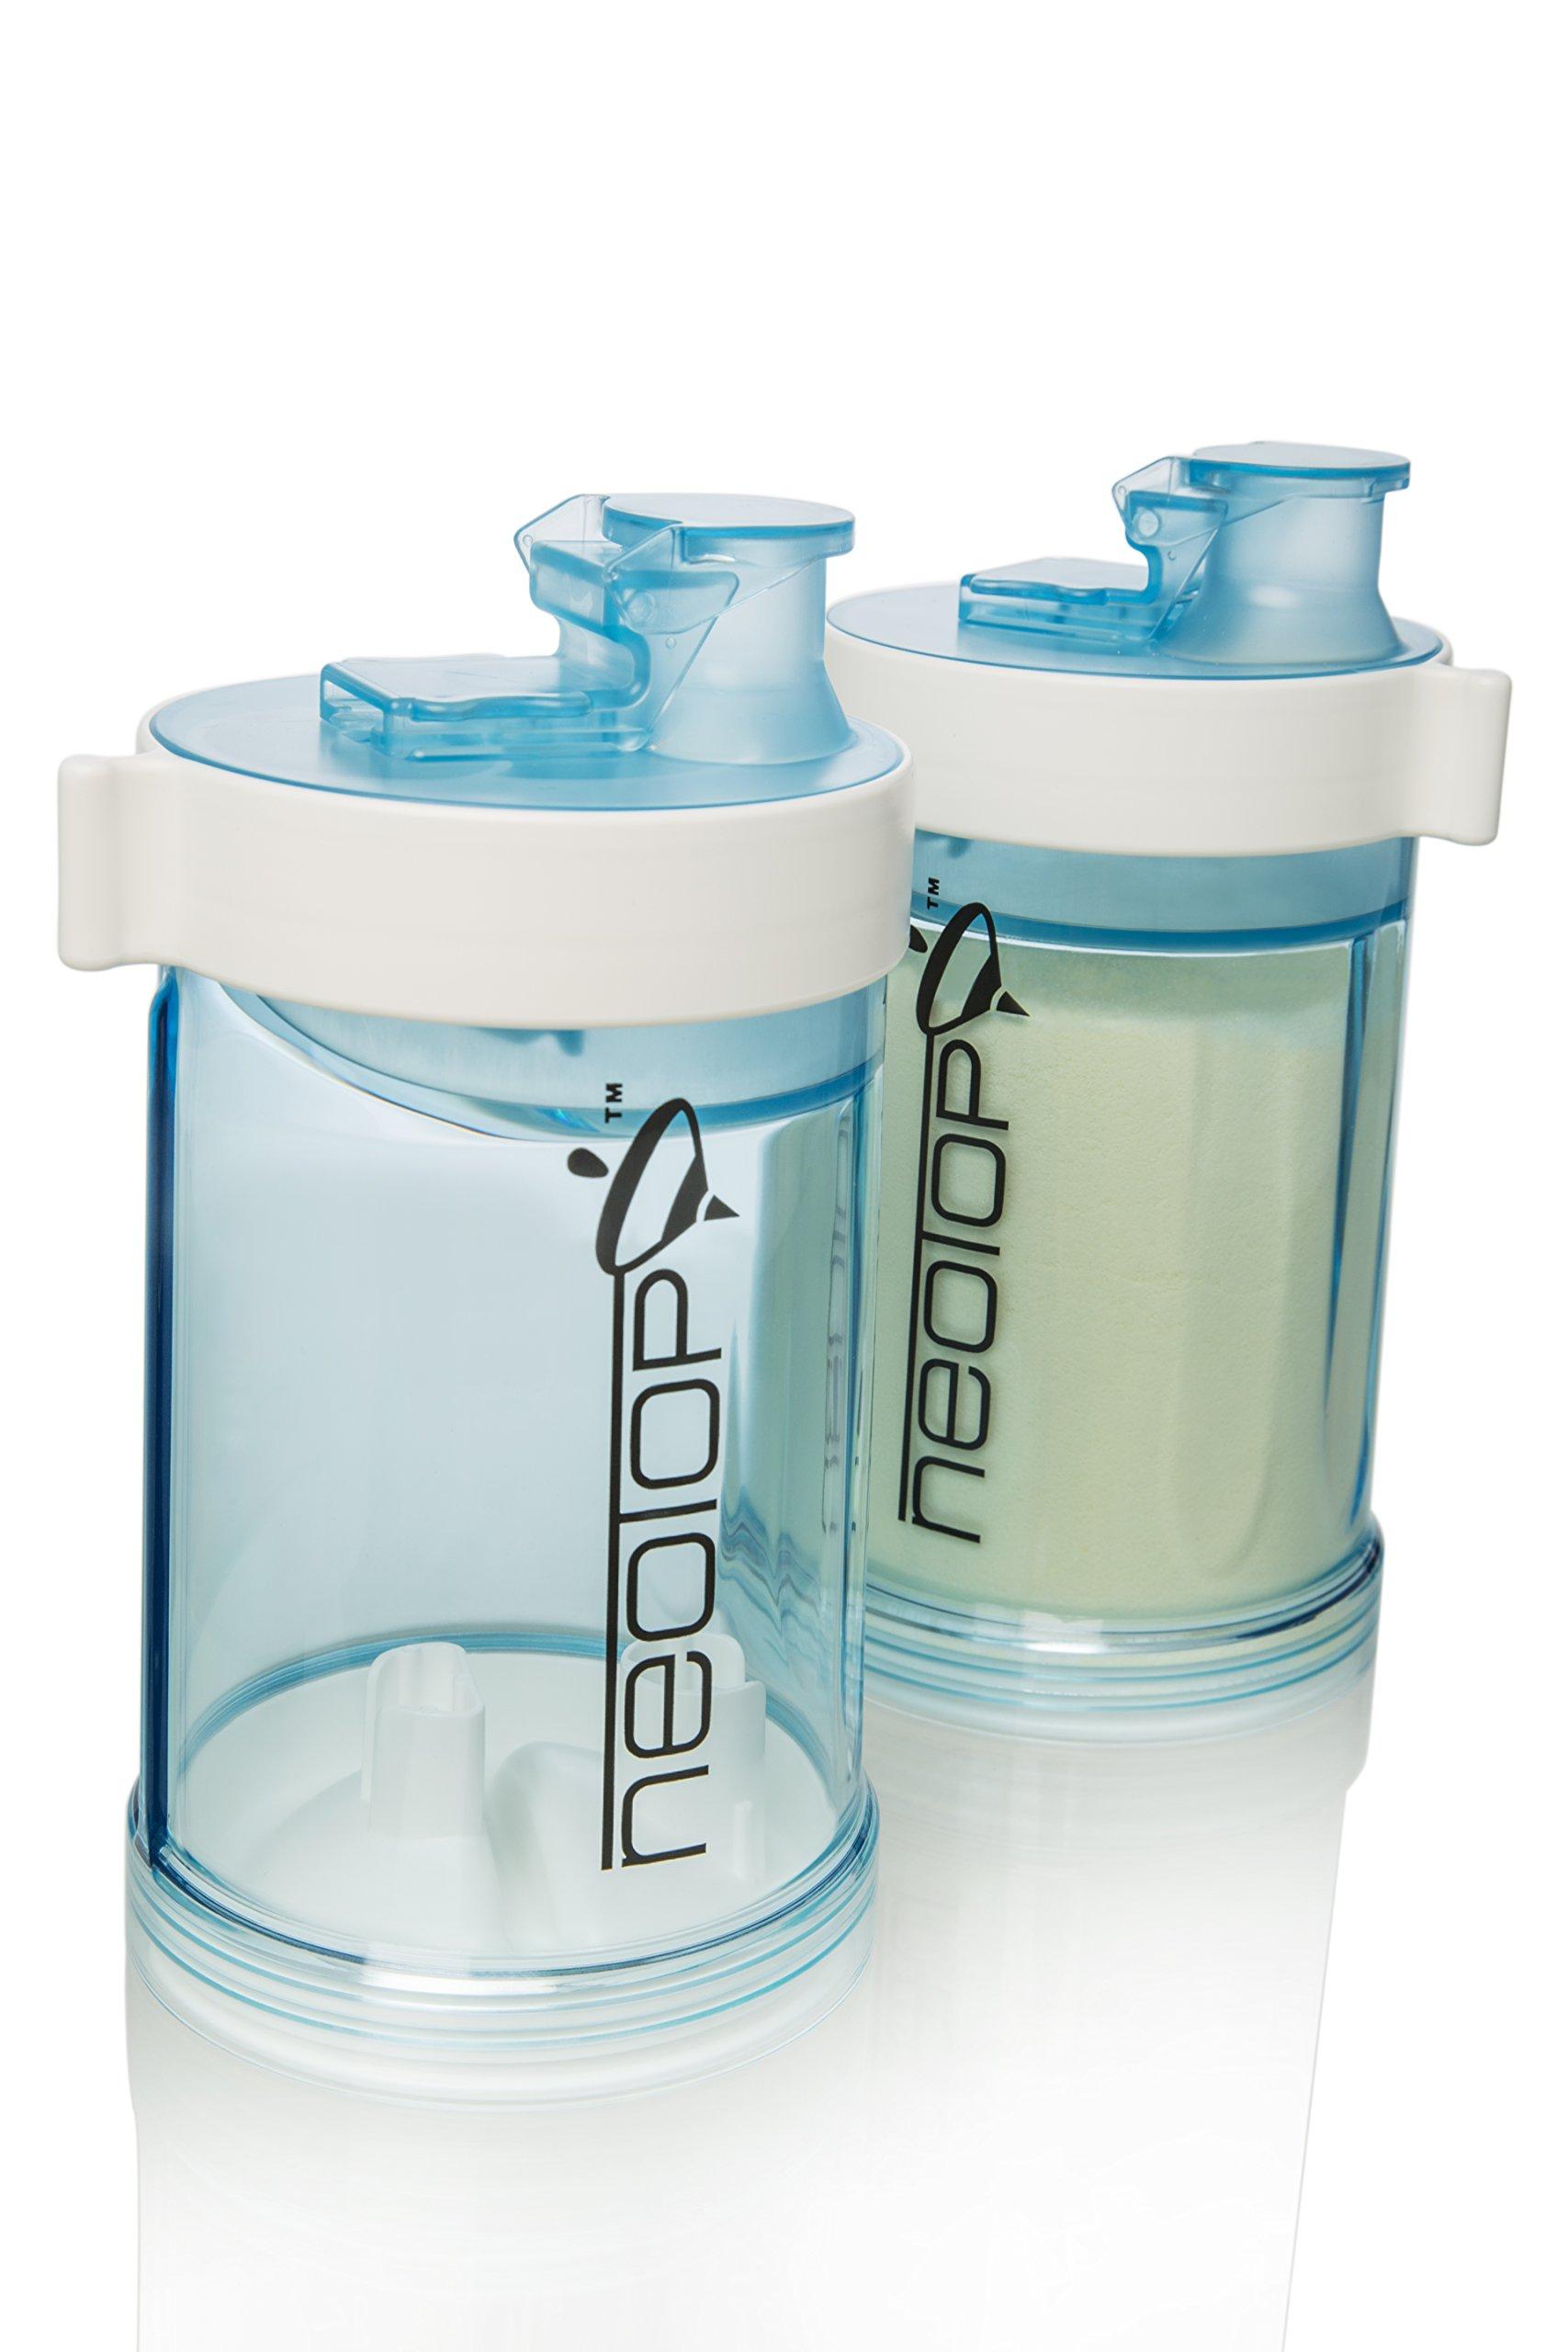 NeoTop Baby Formula Dispenser